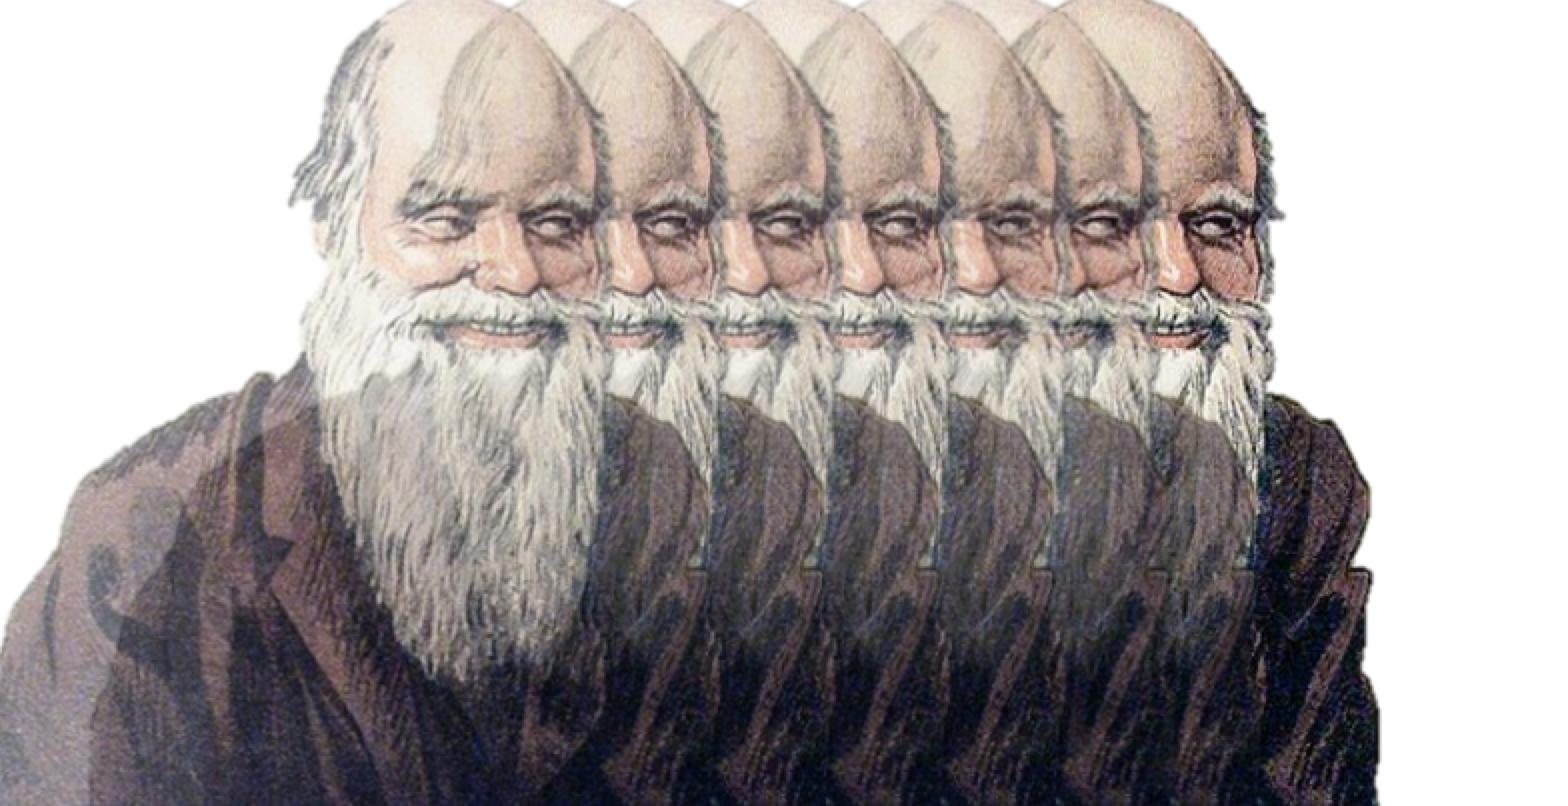 The Darwinian Causes of Mental Illness